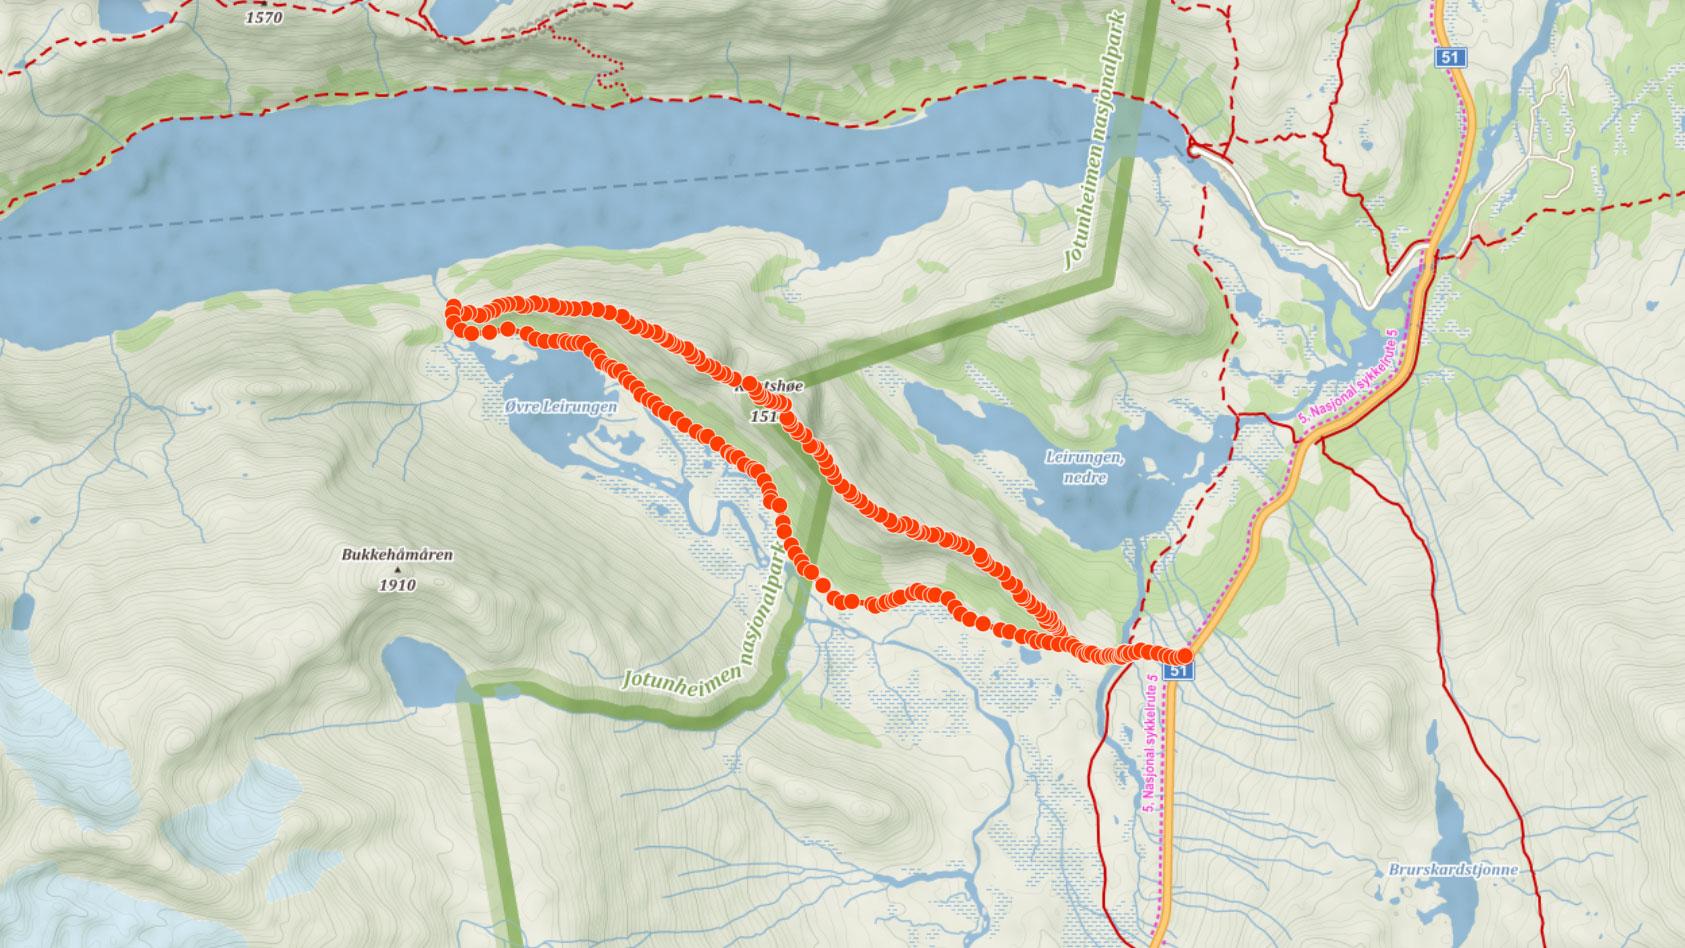 Trasa na Knutshøe v národním parku Jotunheimen v Norsku